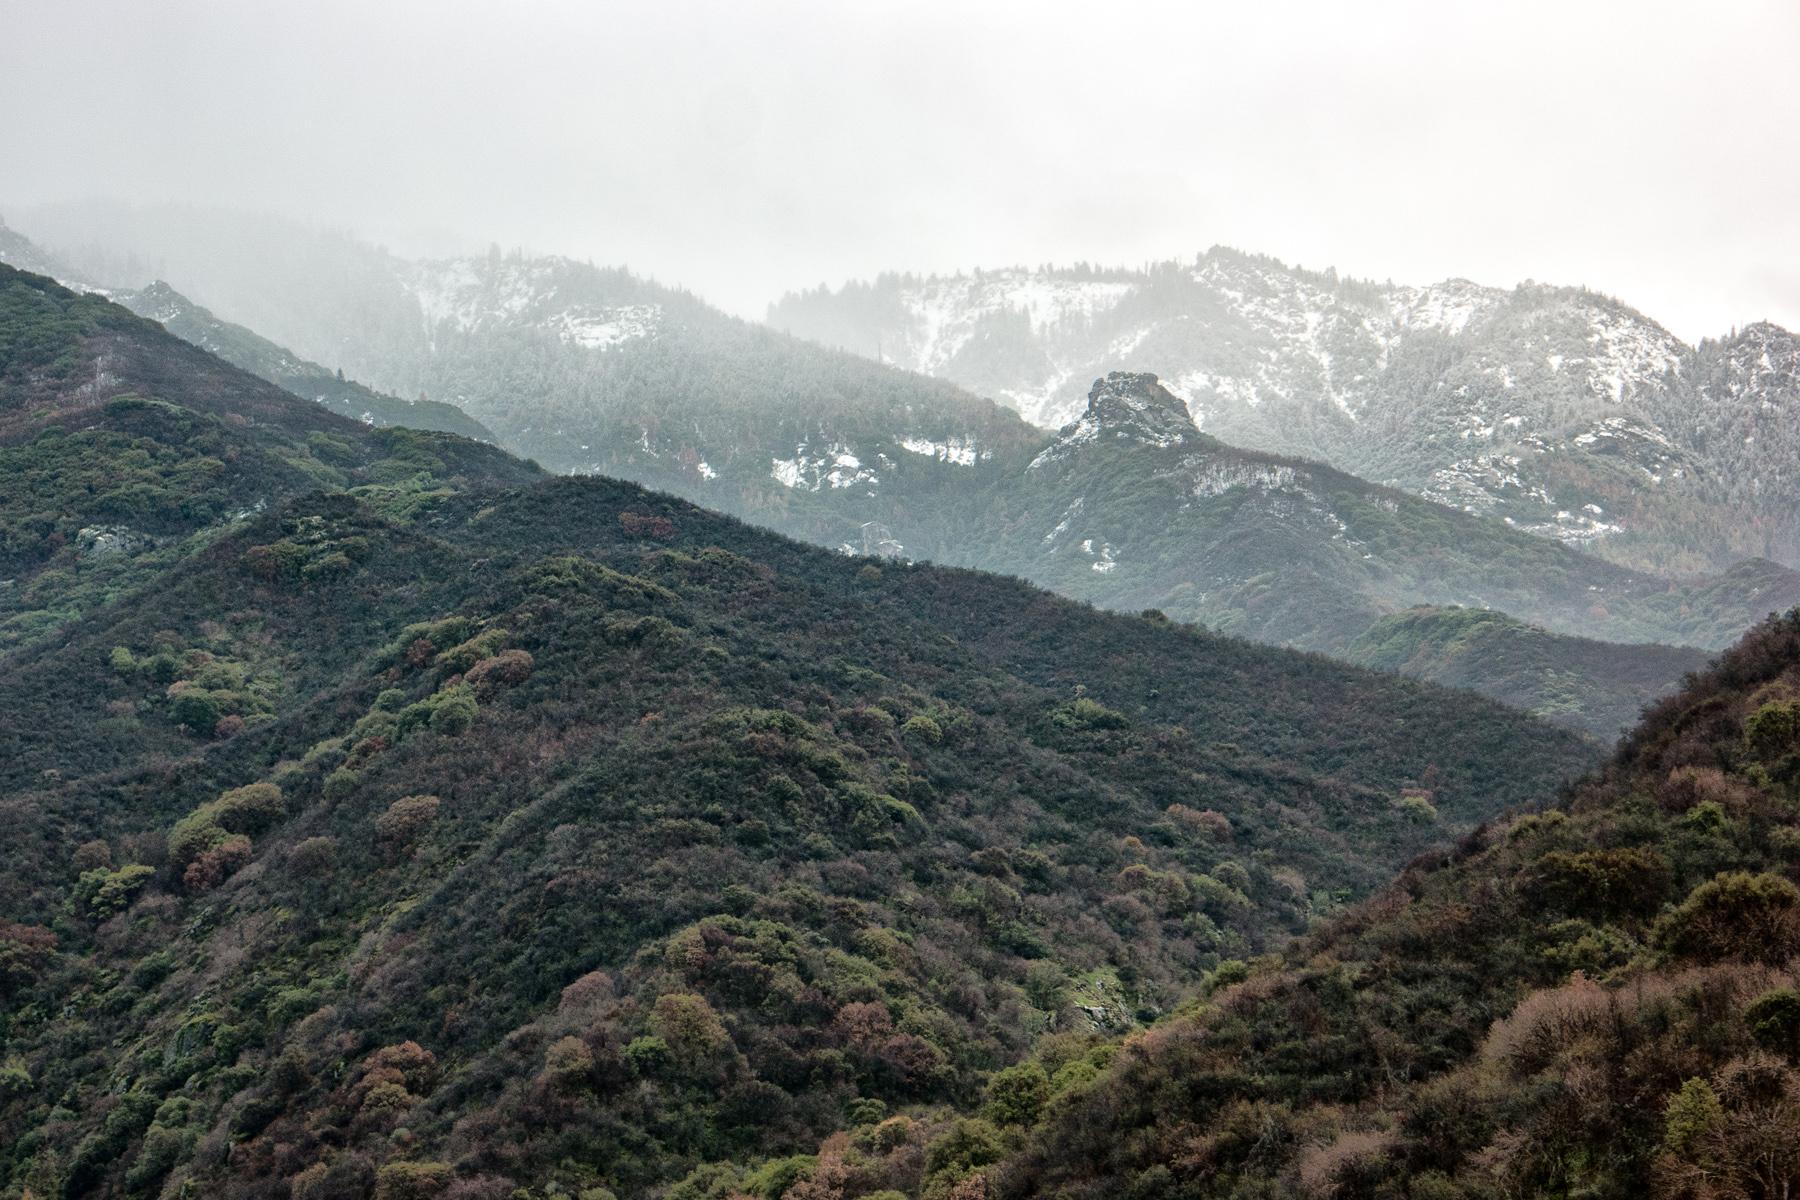 Wasim Muklashy Photography_Sequoia National Park_California_December 2015_-SAM_4771-Edit.jpg